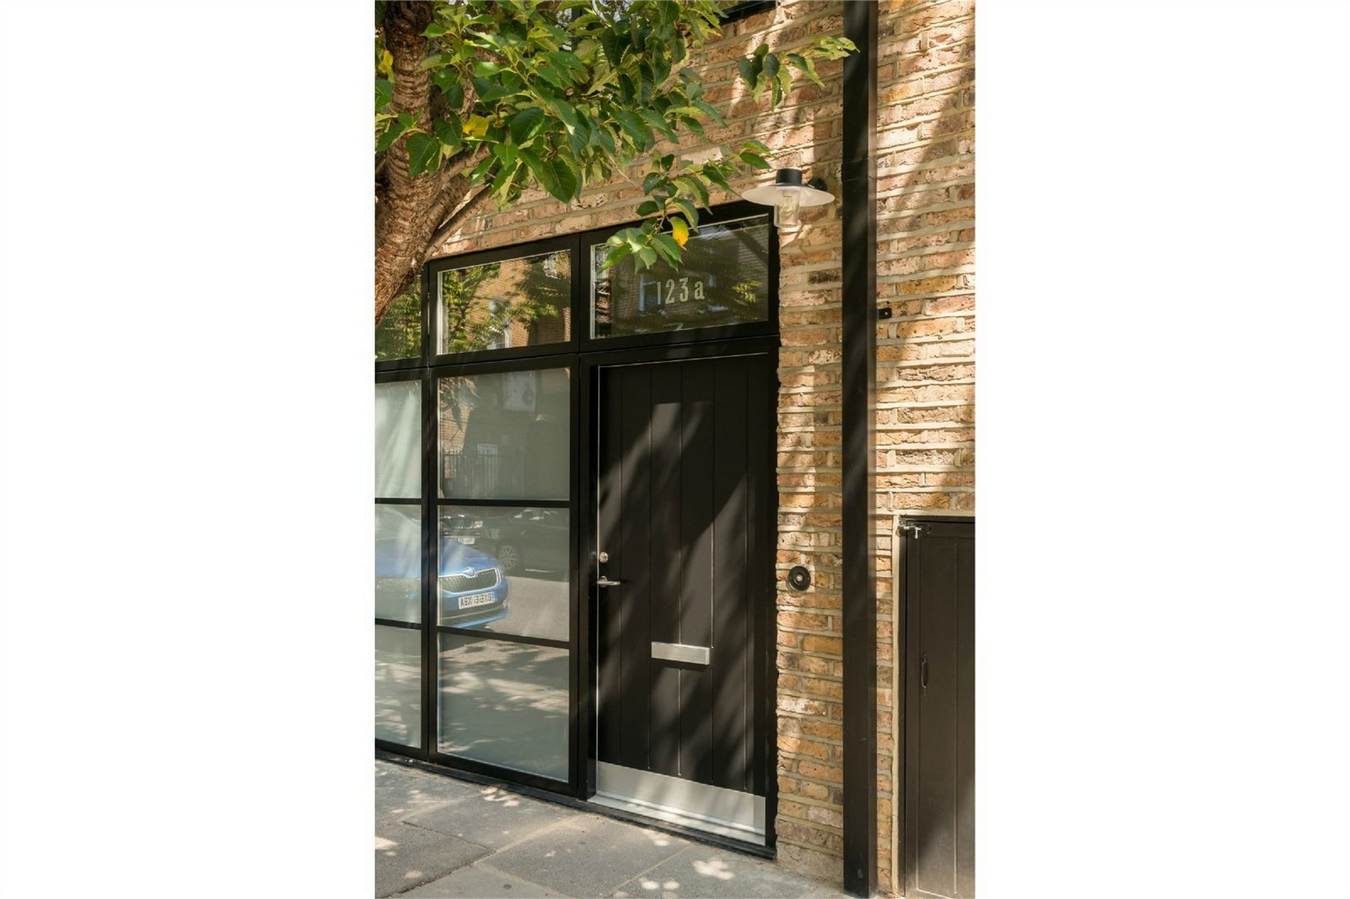 2 Bedroom Flat For Sale In Godolphin Road W12 London